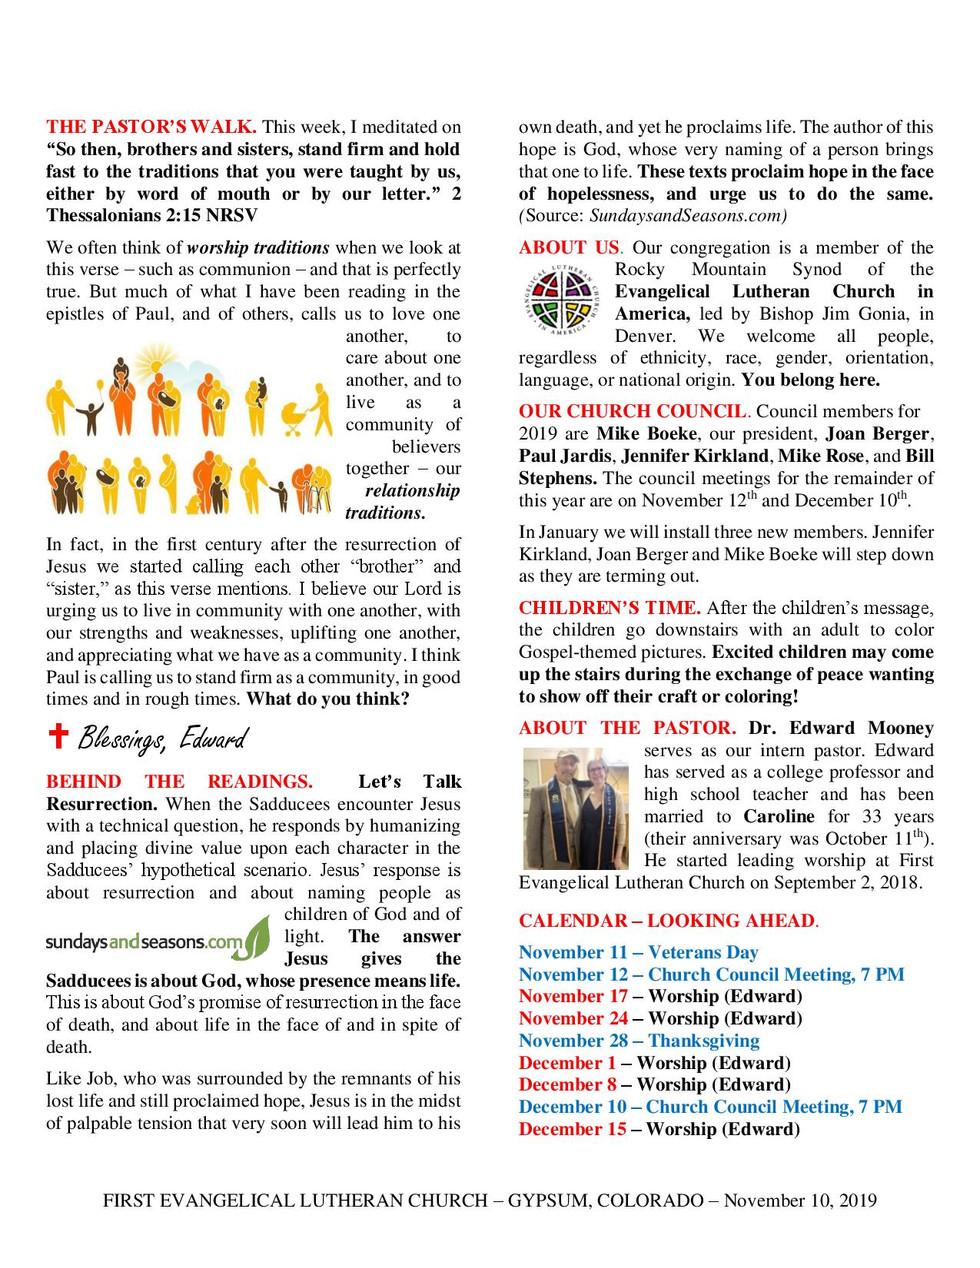 Newsletter - November 10, 2019, Page 2